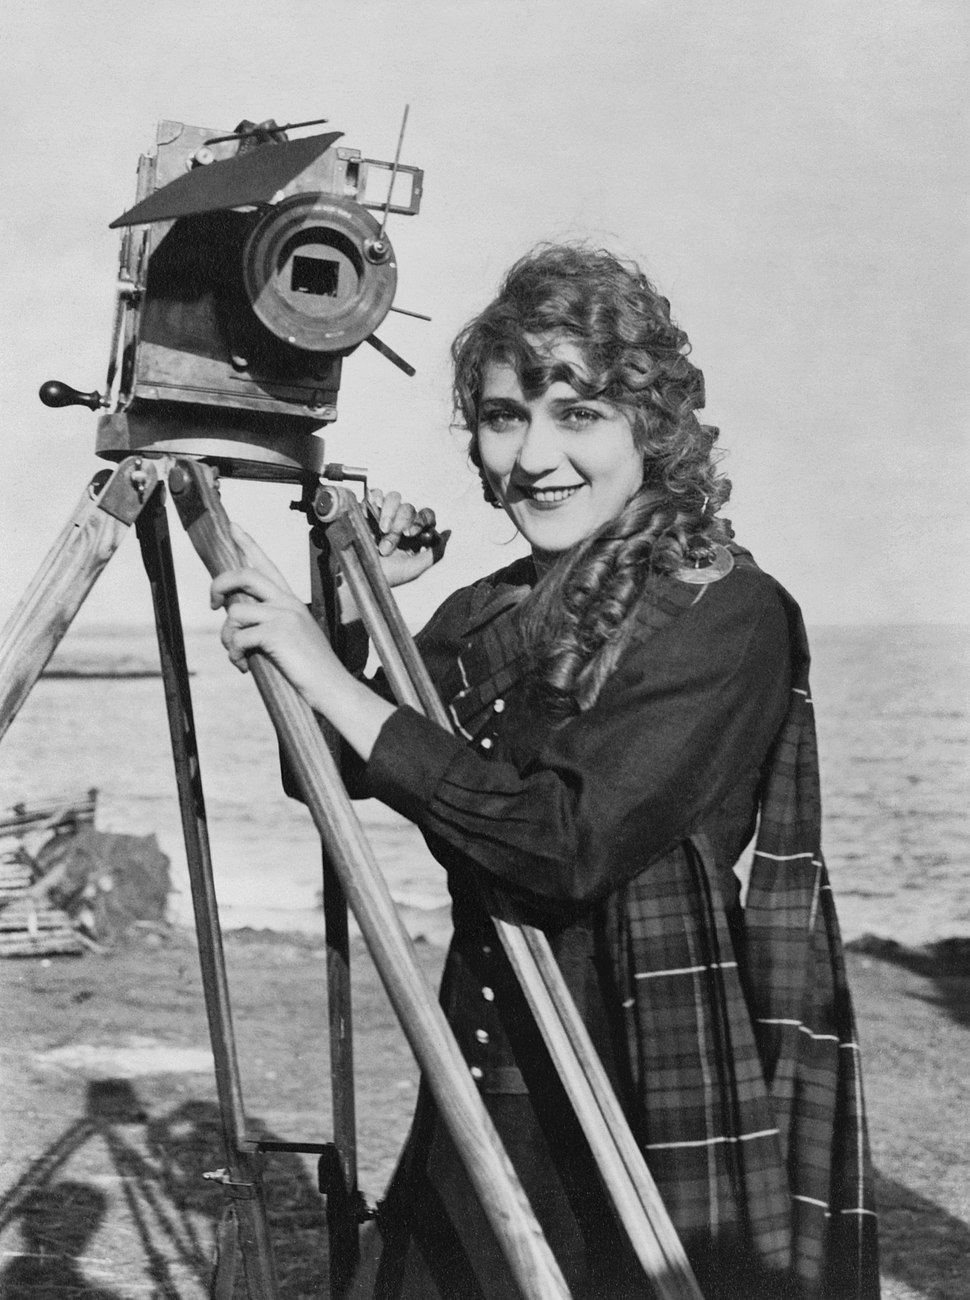 Mary Pickford with camera2